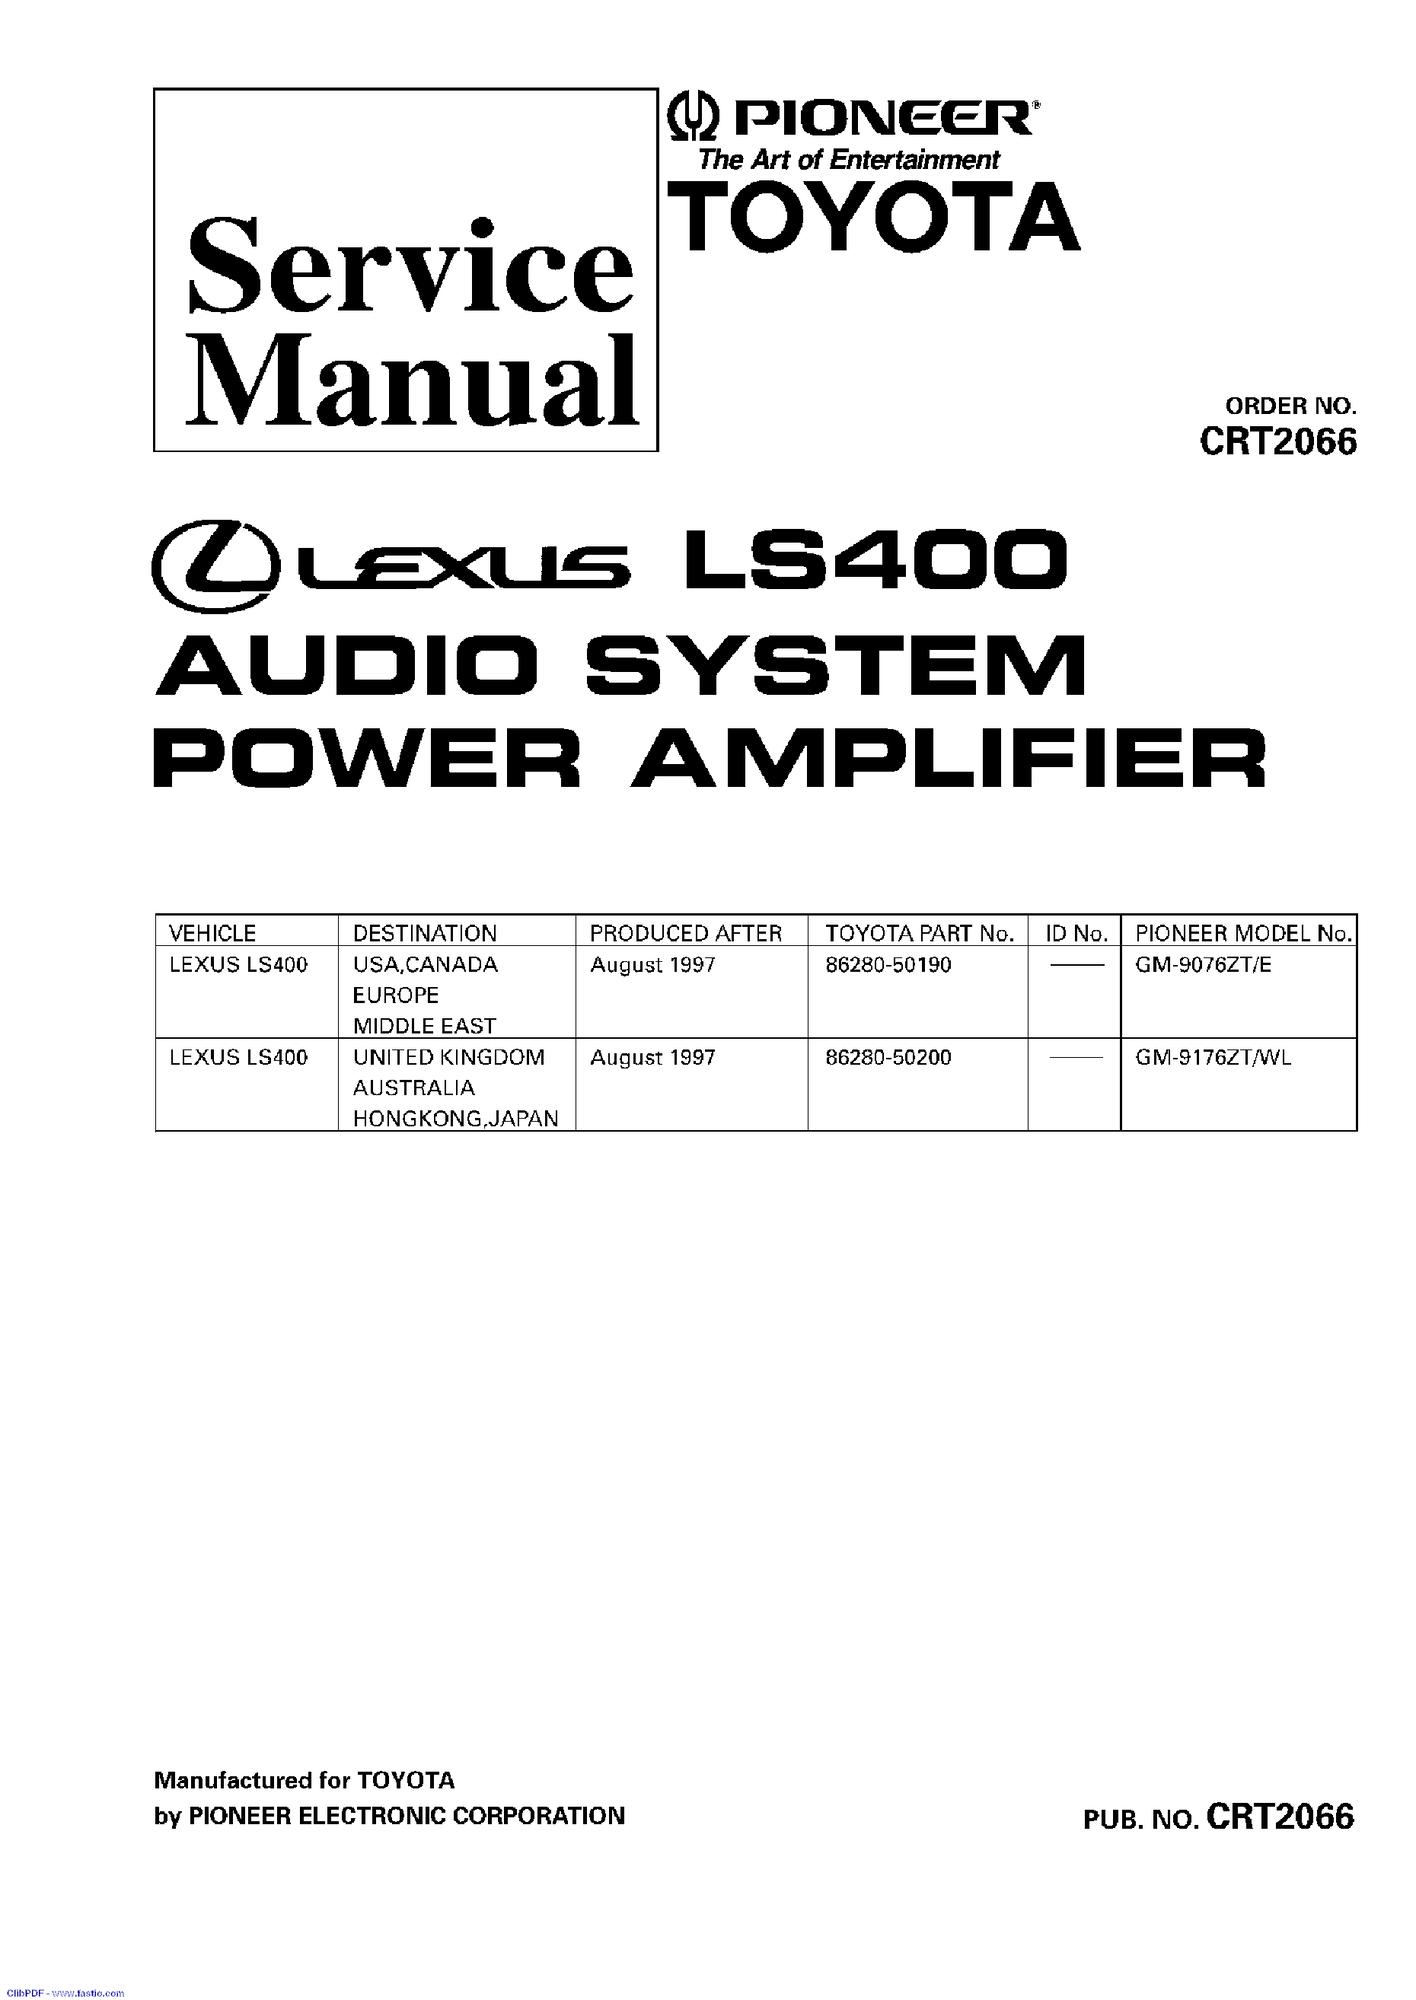 KEX-M9076ZT is correct Pioneer model #.